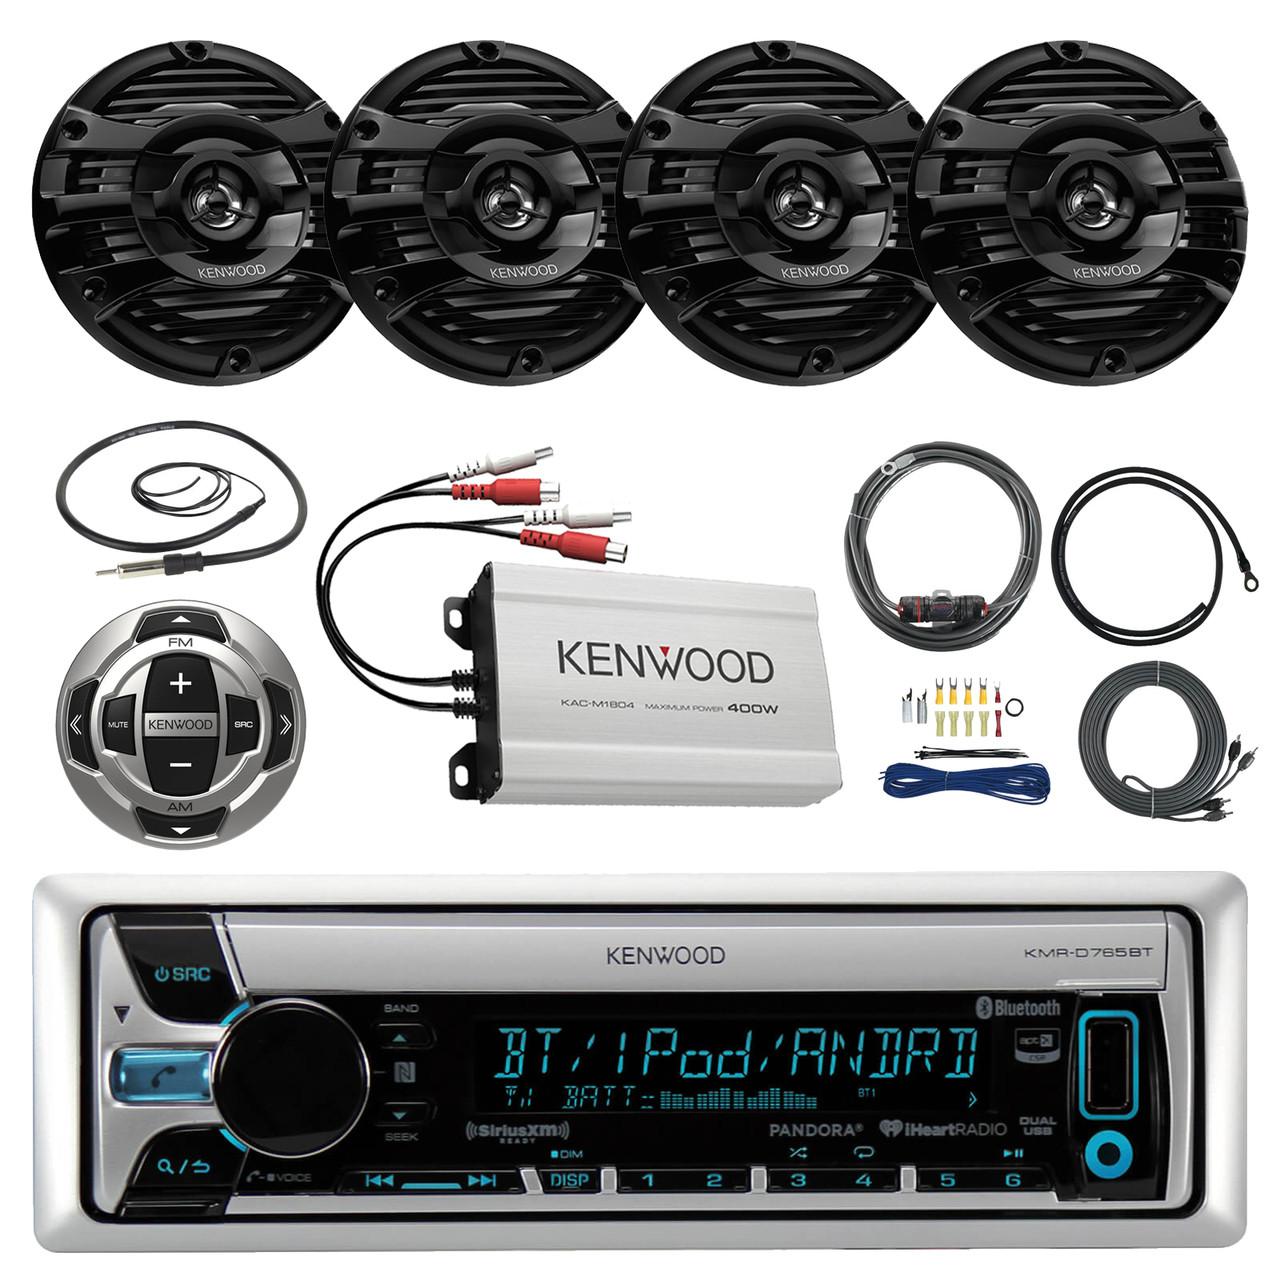 hight resolution of 21 29 pontoon boat marine system kenwood kmr d768bt bluetooth receiver 4 x 6 5 speakers 4 channel amplifer kenwood wired remote t spec v8 series